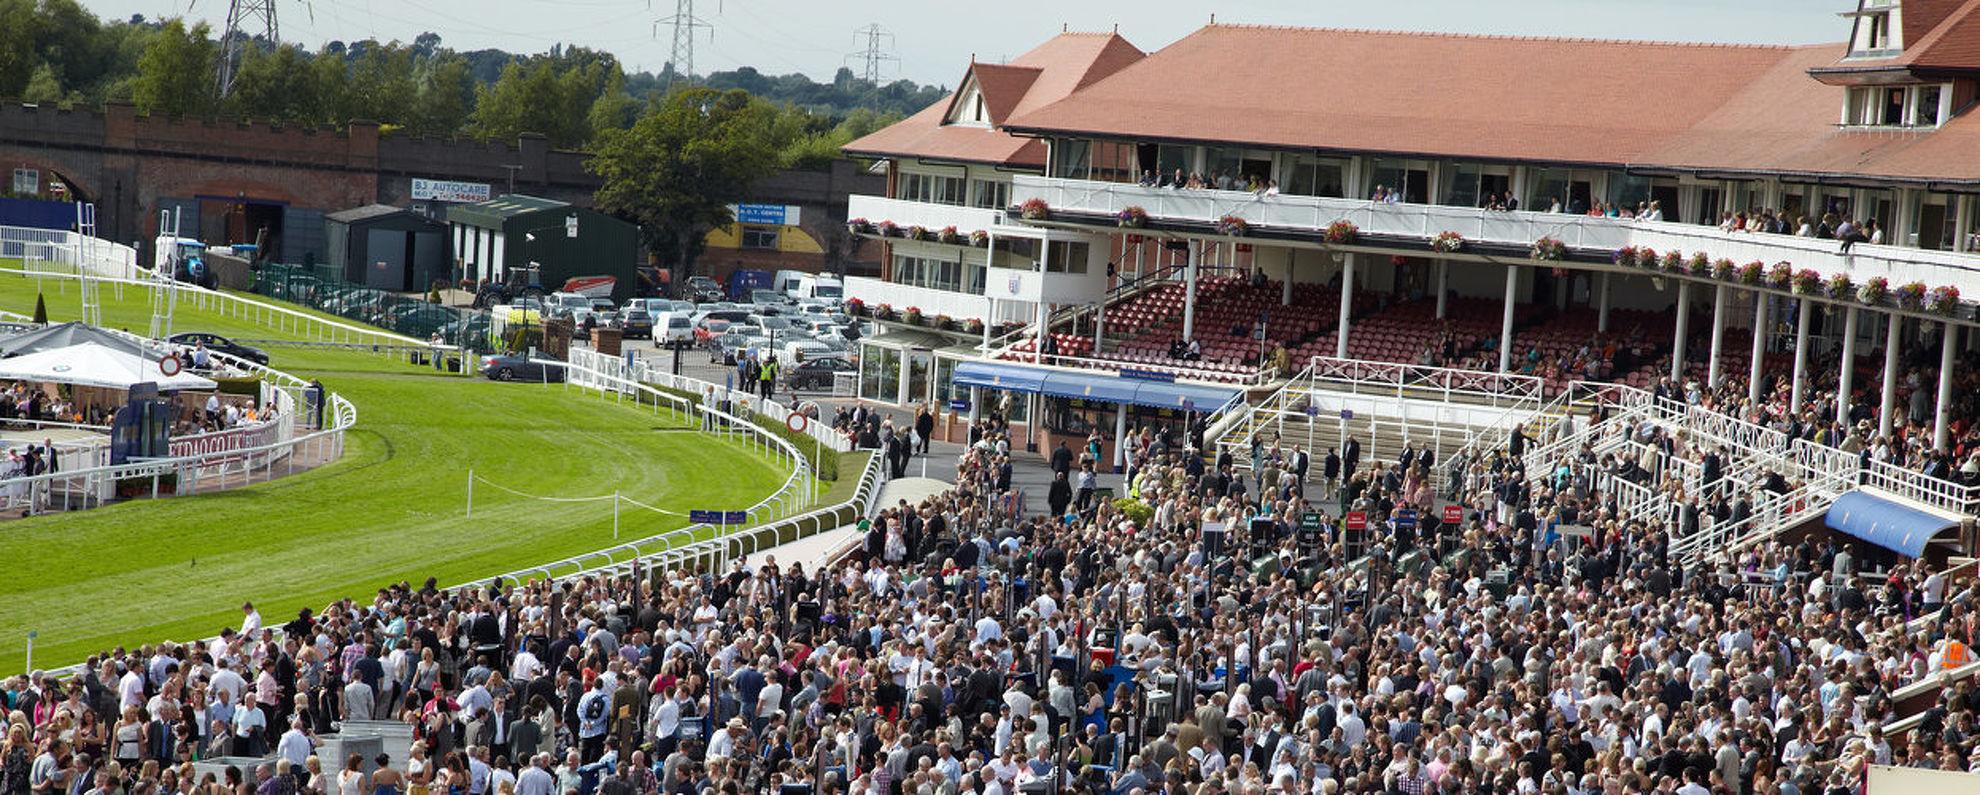 Explore Chester Racecourse